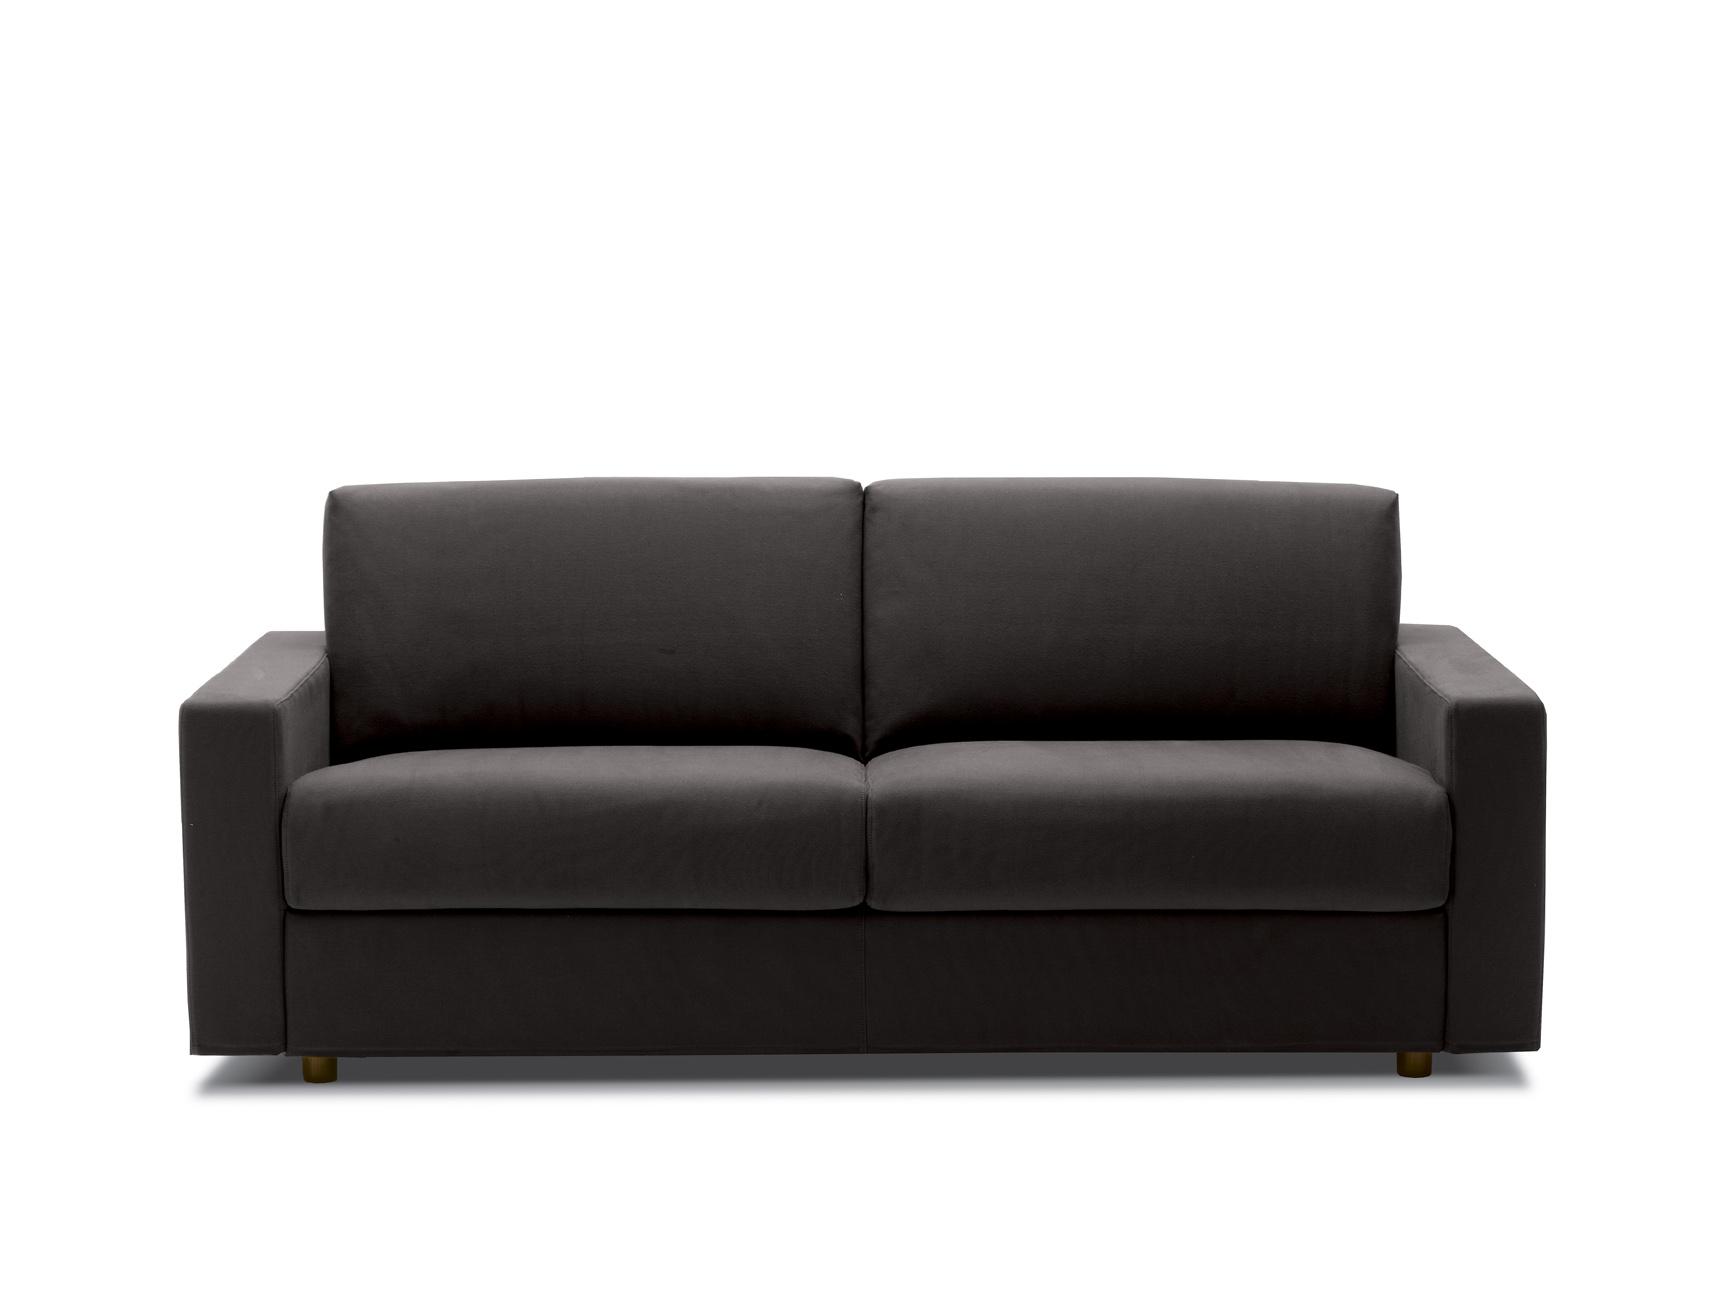 canap lit omar design studio mb. Black Bedroom Furniture Sets. Home Design Ideas